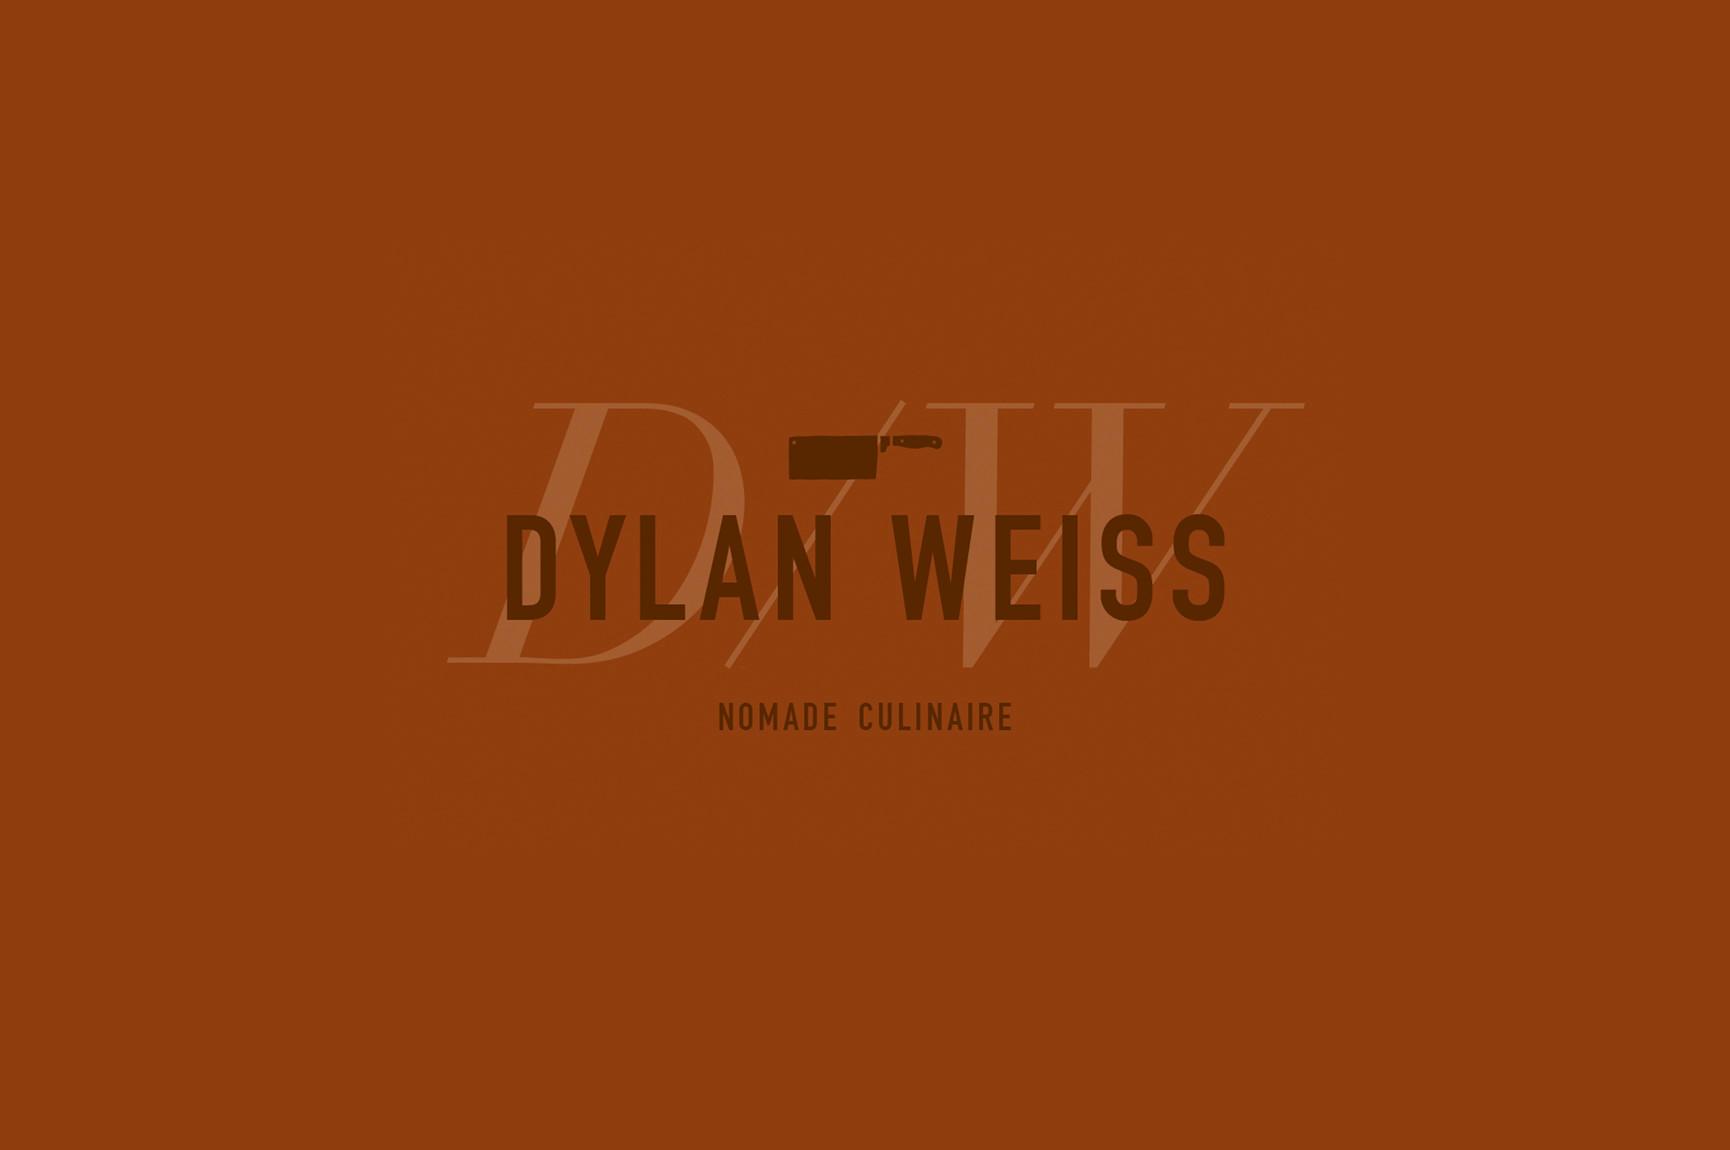 DylanWeiss01.jpg